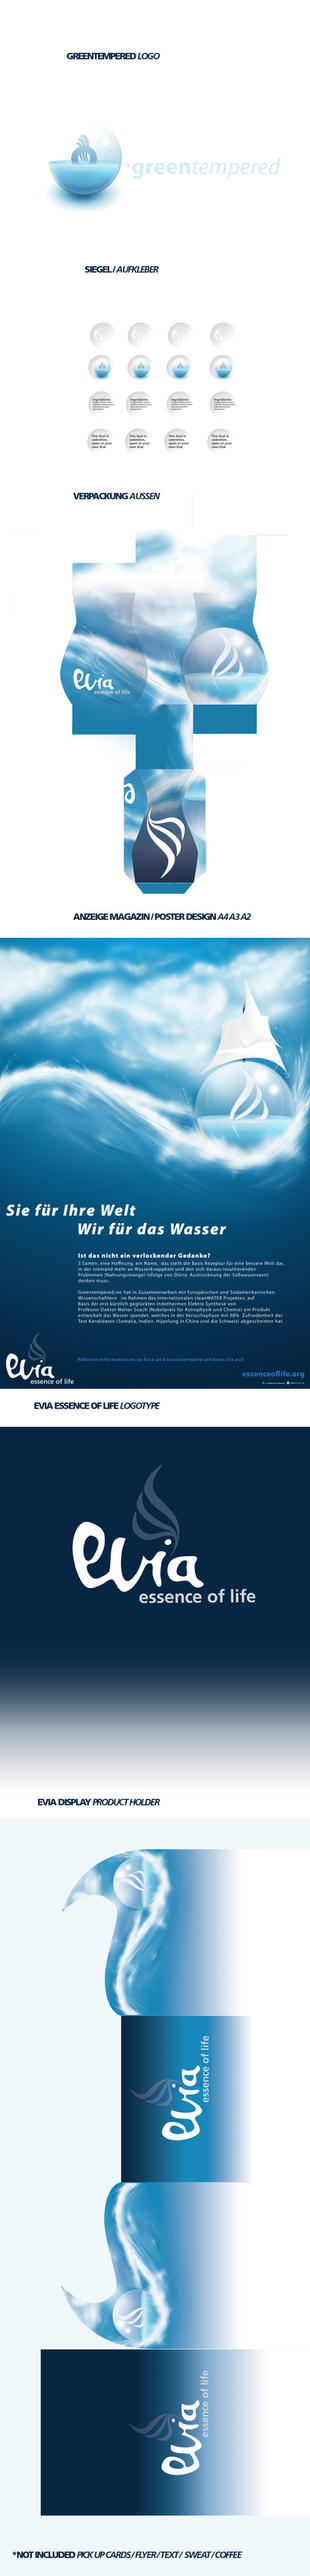 EVIA ESSENCE OF LIFE PART I by fERs